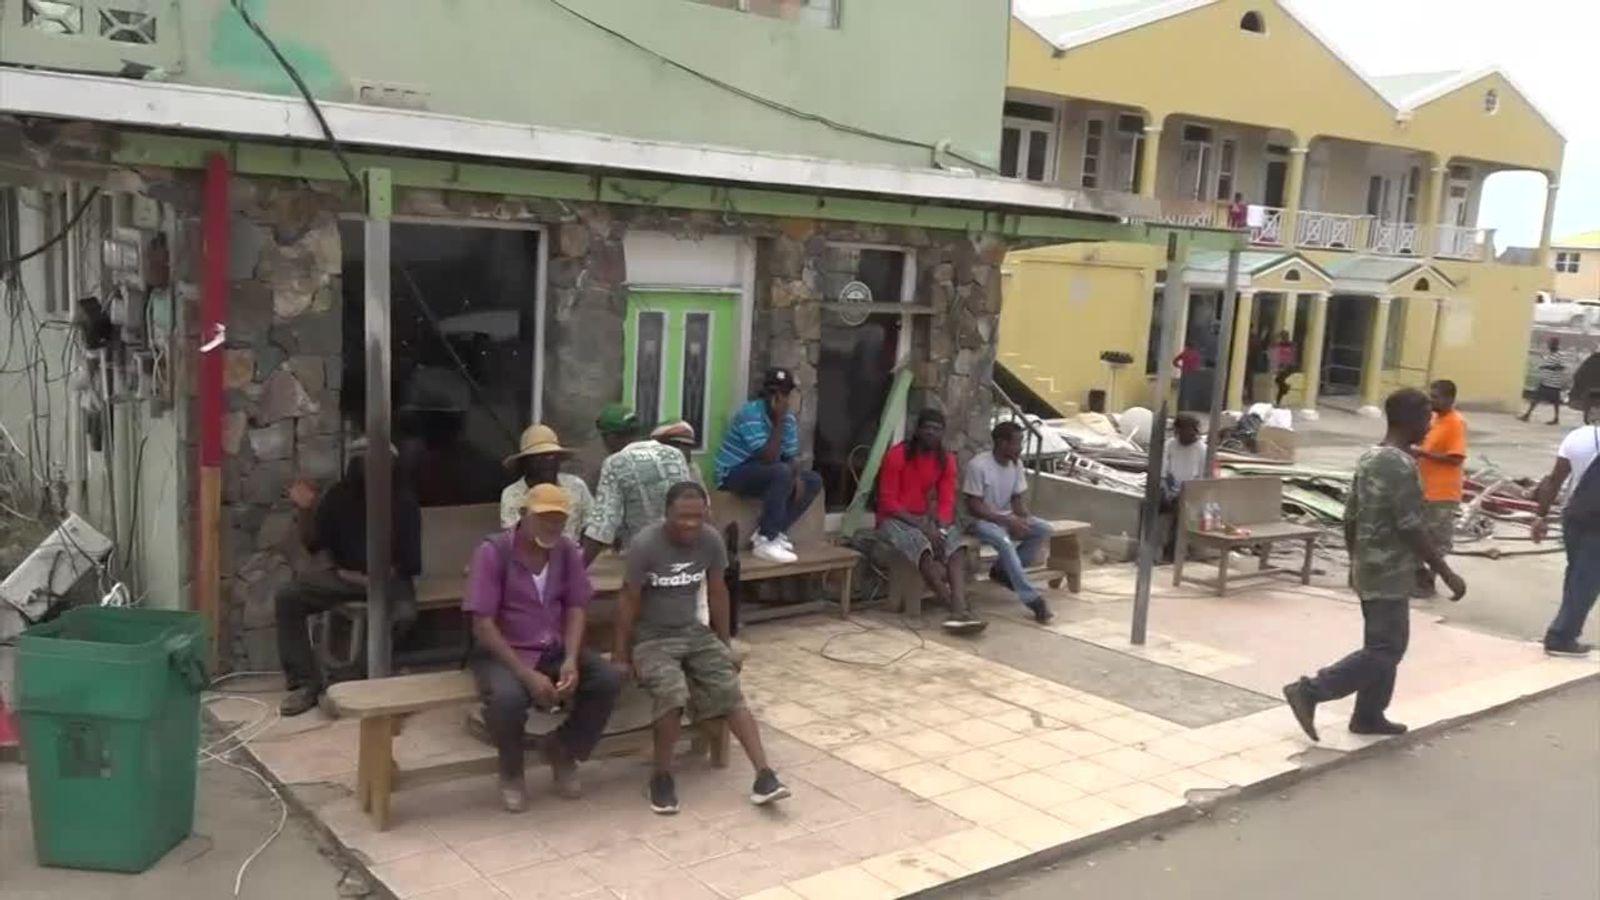 Hurricane Jose spares storm-ravaged French Caribbean islands